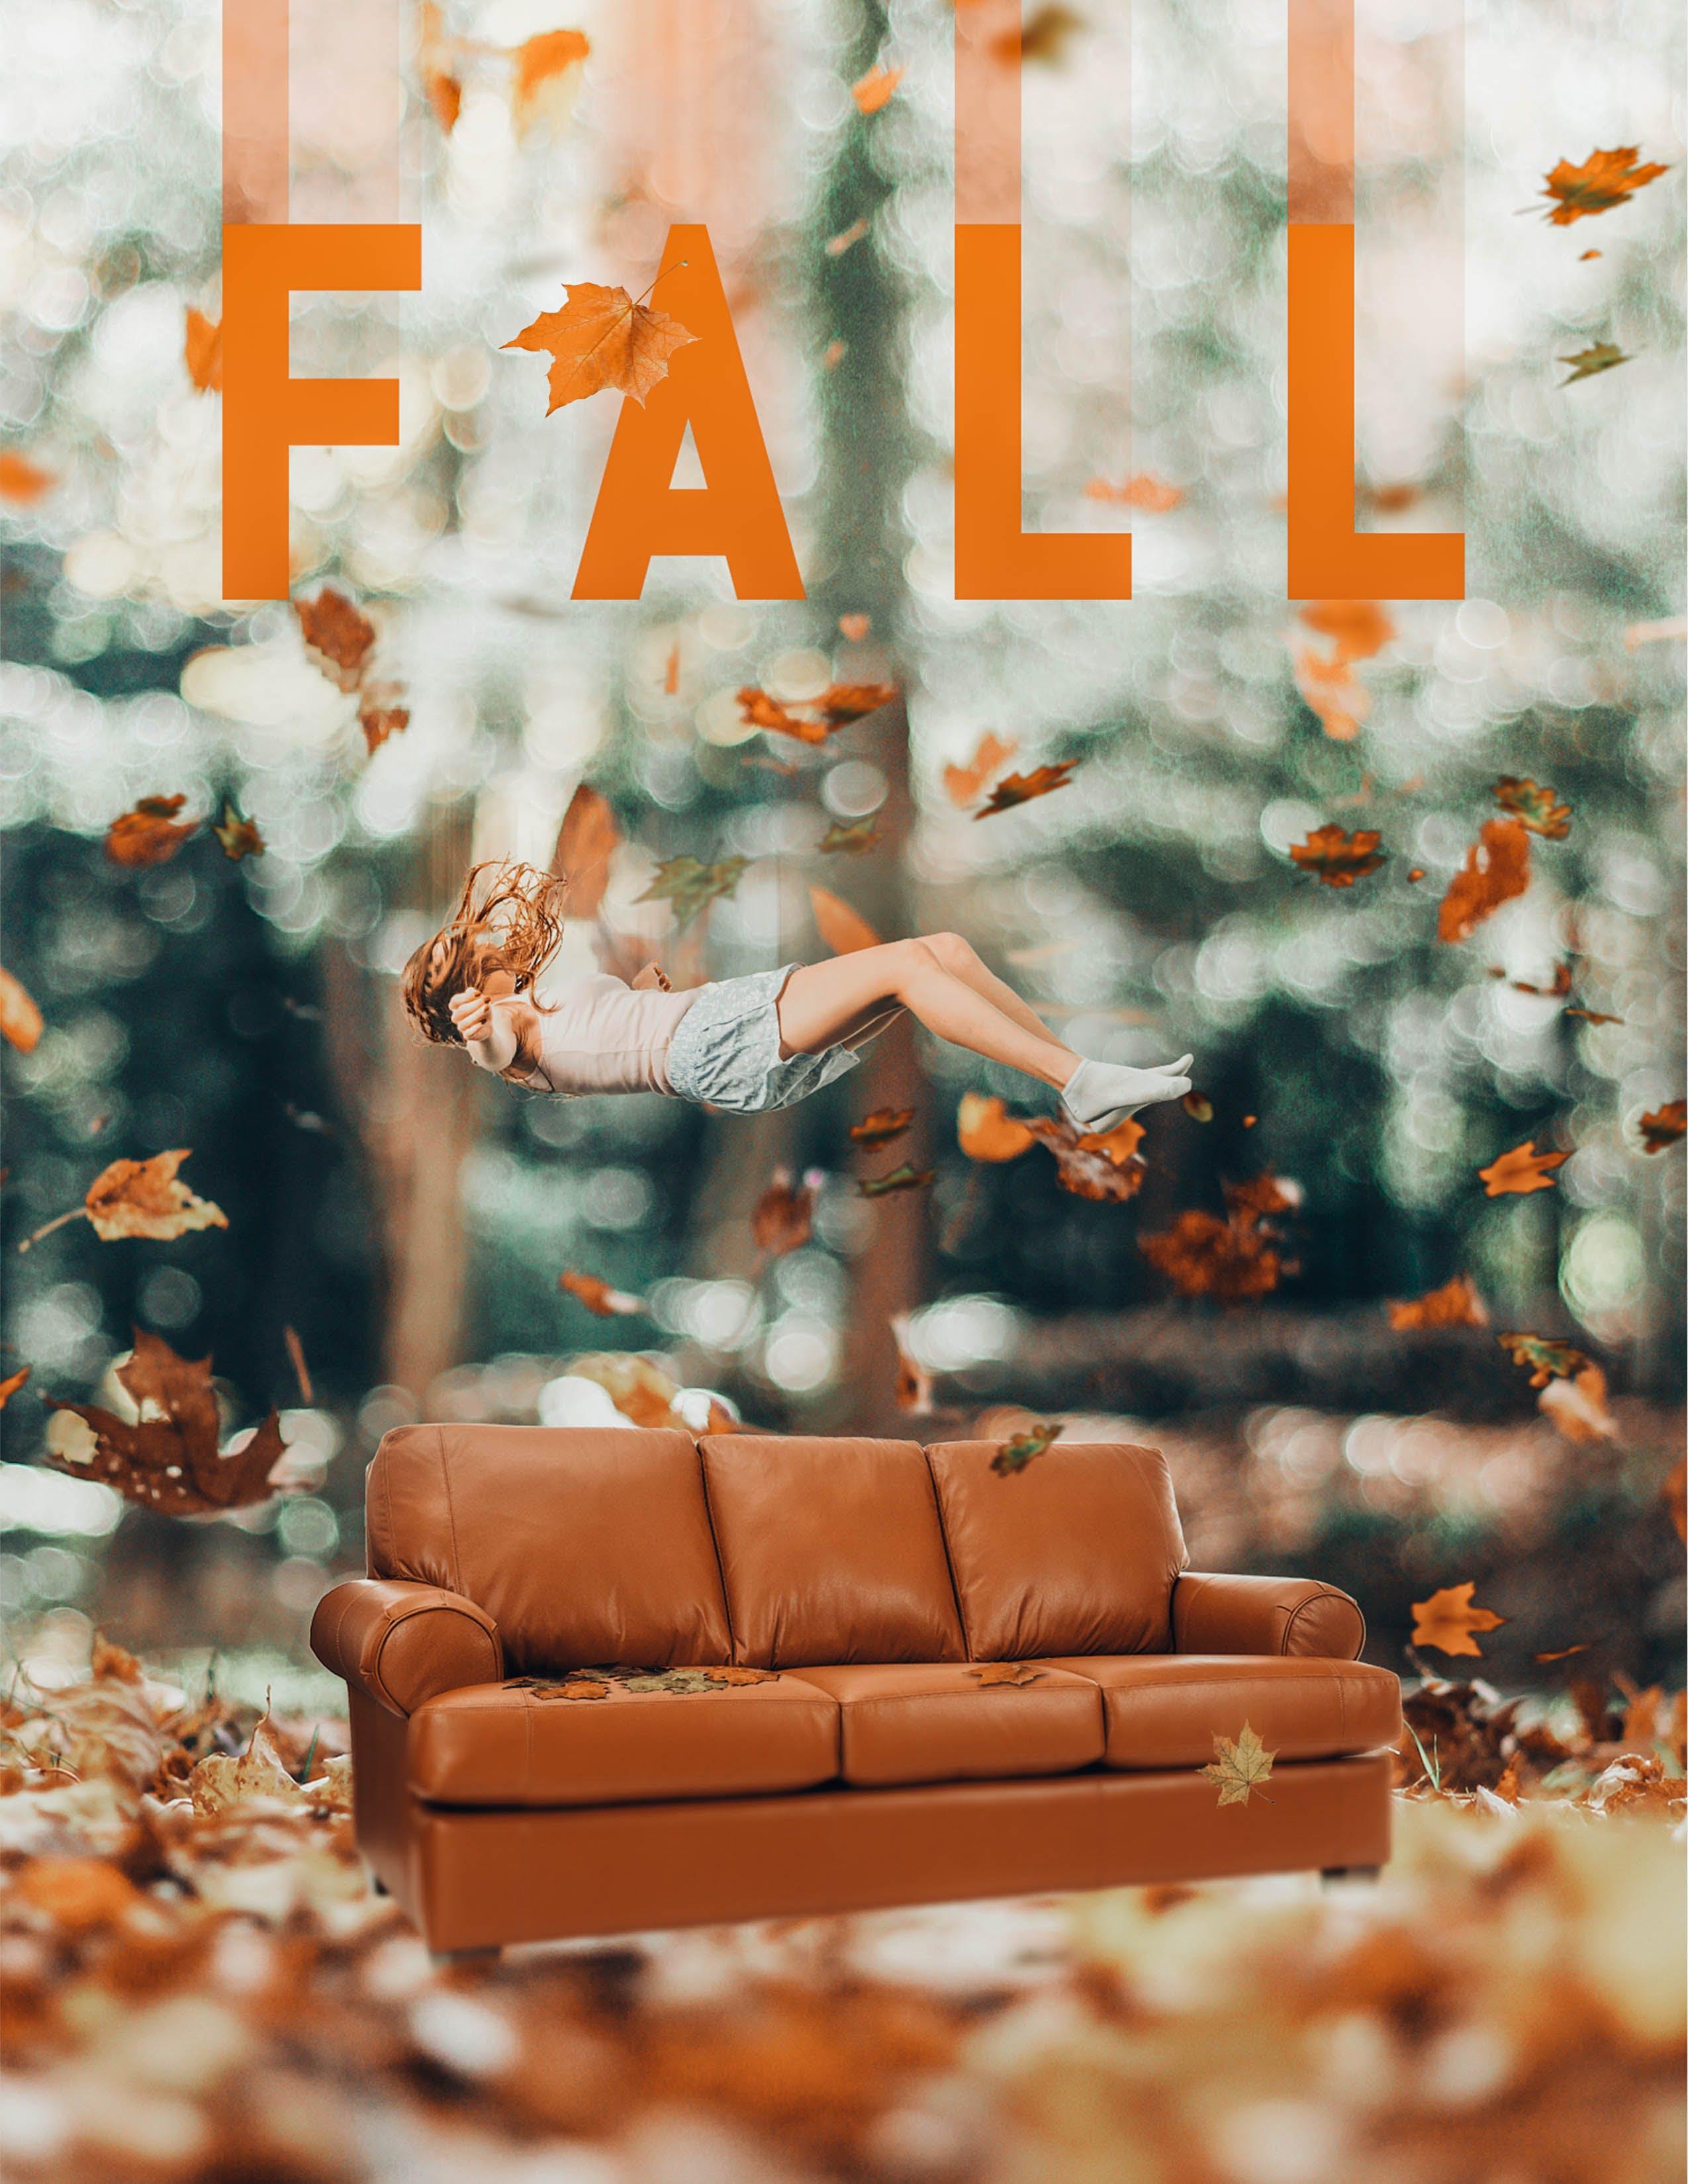 Free stock photo of advertise, advertisement, autumn, autumn colors